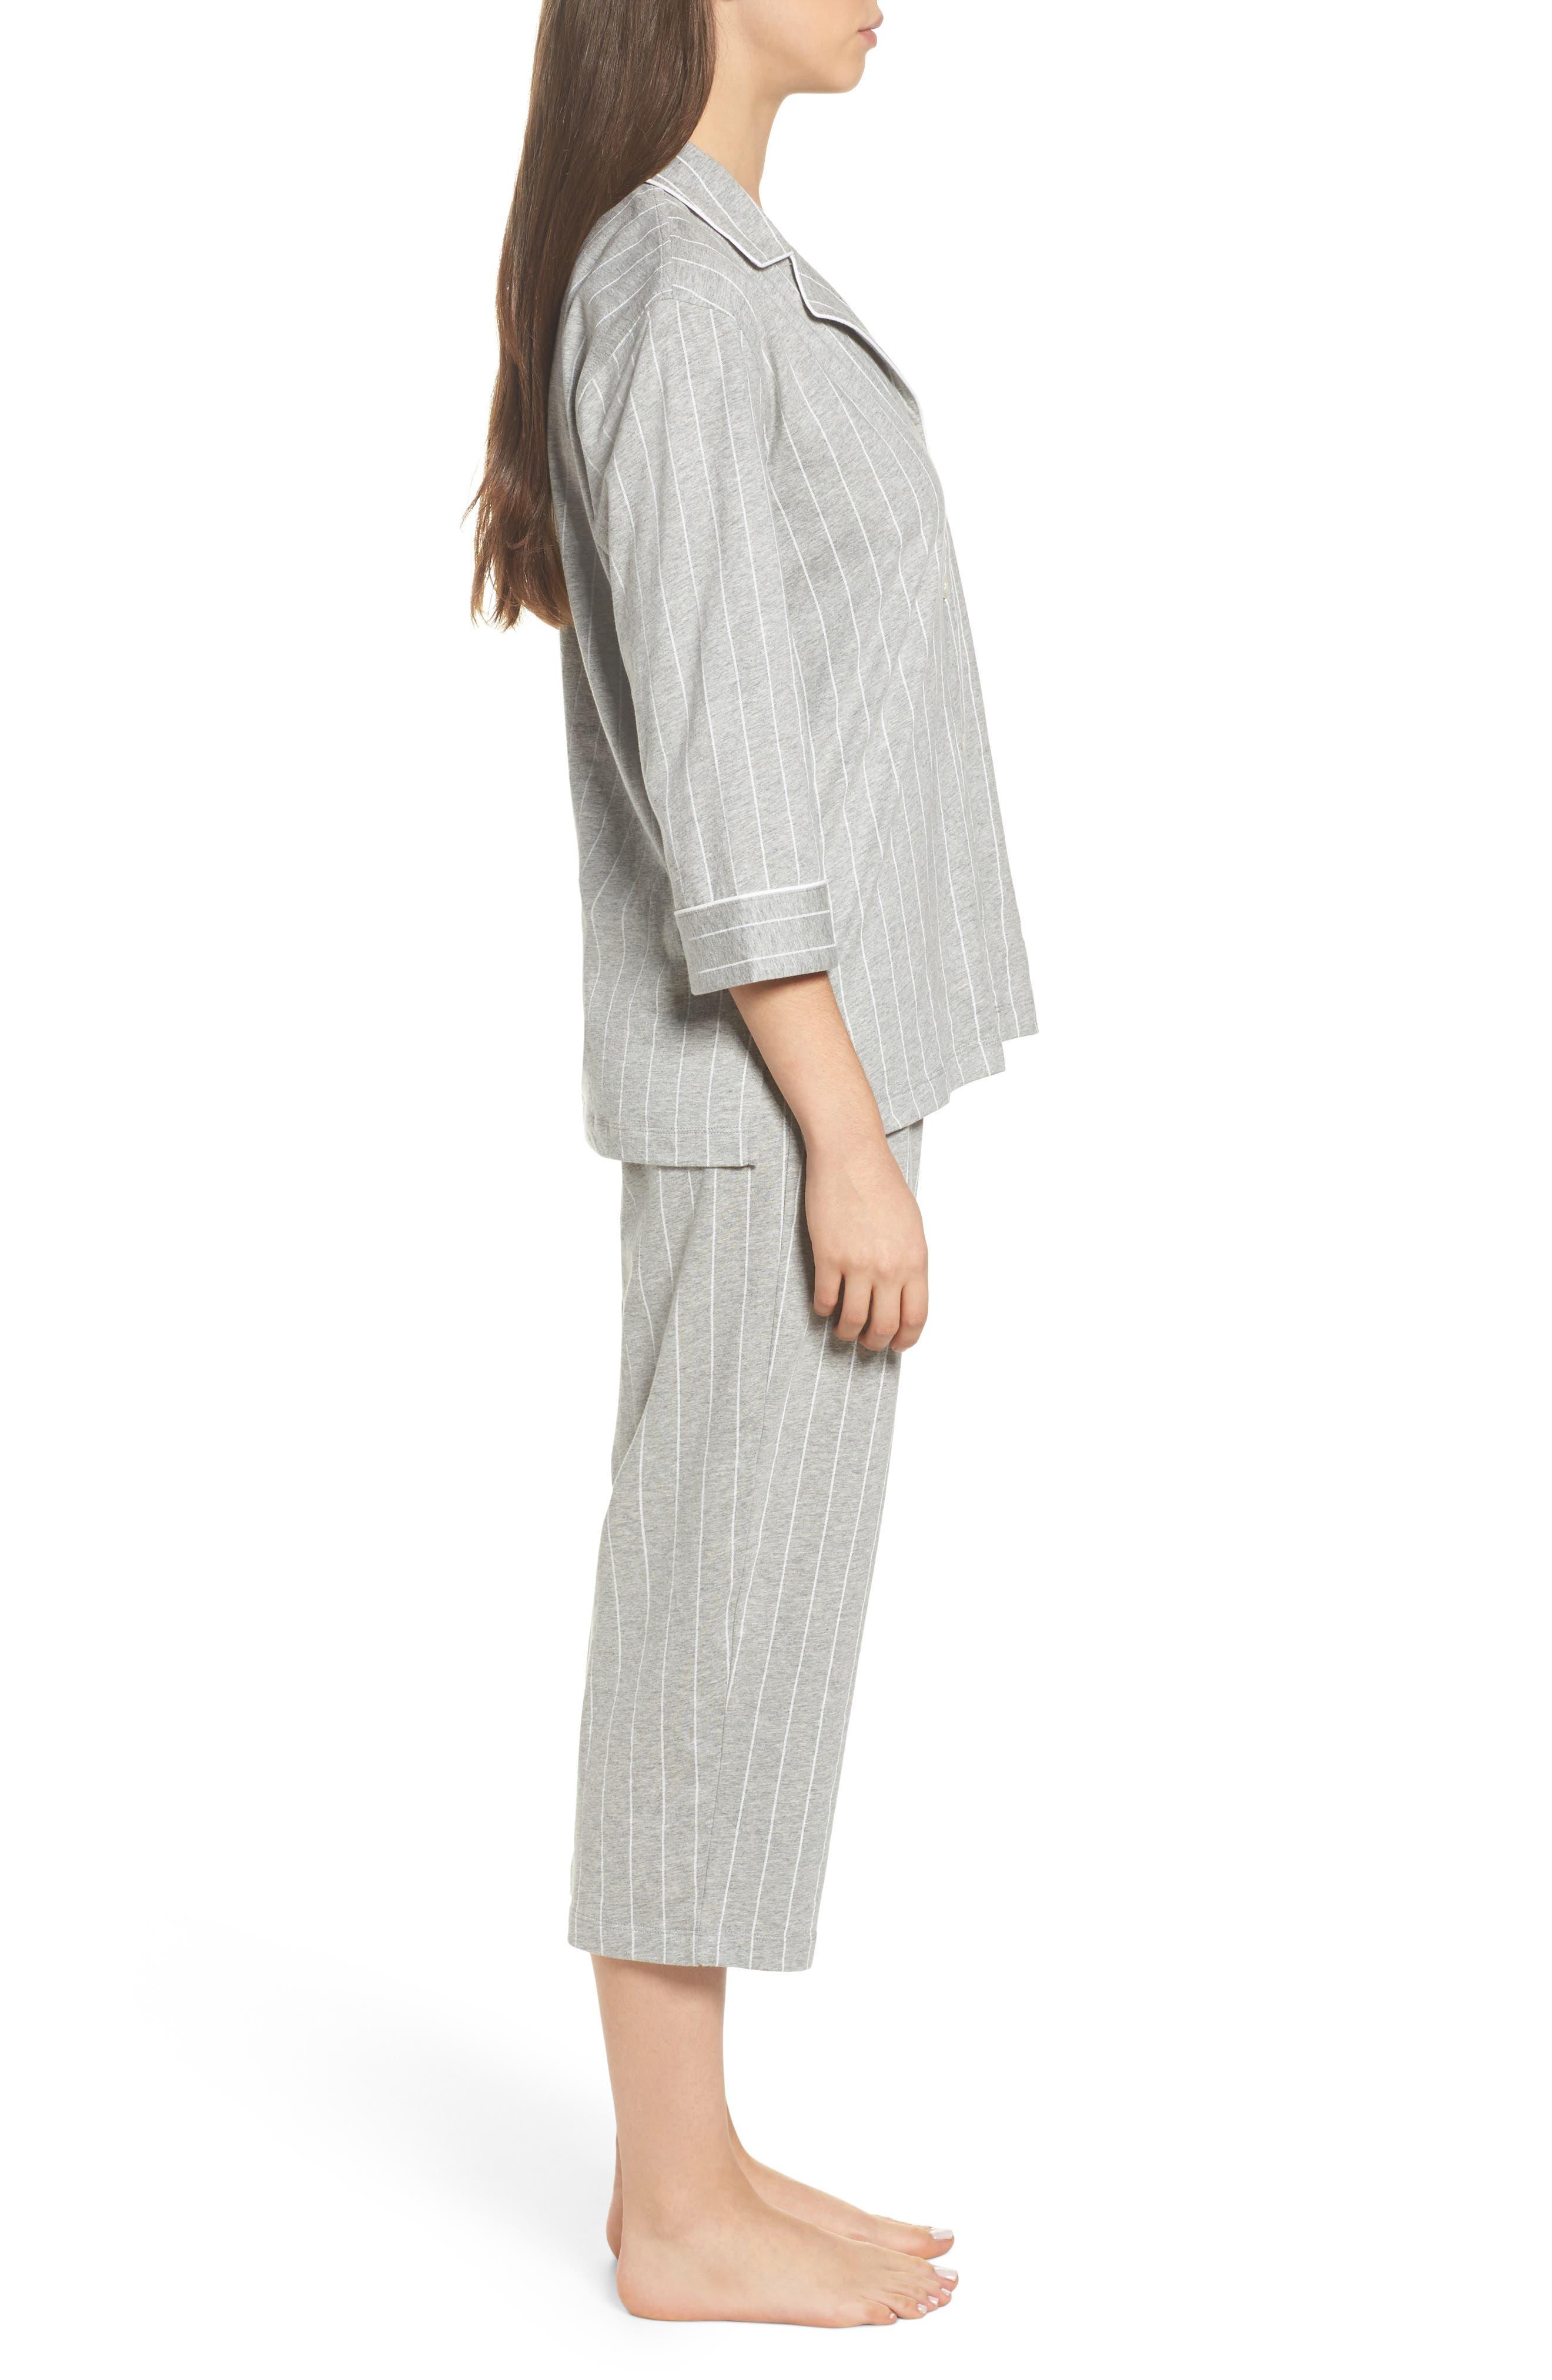 LAUREN RALPH LAUREN, Knit Crop Pajamas, Alternate thumbnail 3, color, GREYSTONE